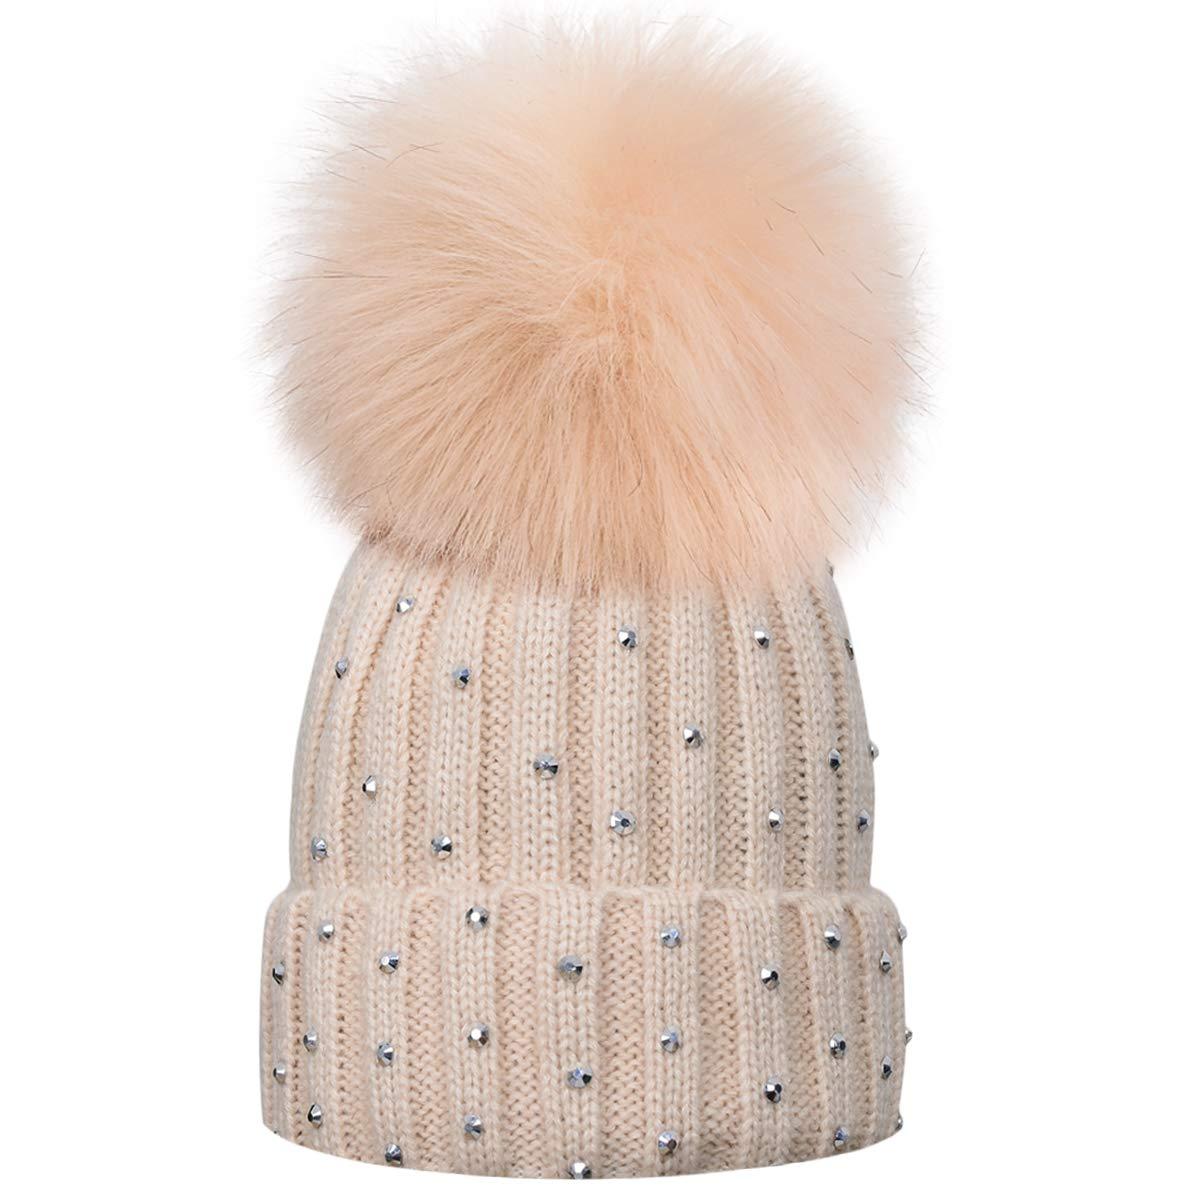 Amazon.com  Sunlightfree Kids Knitted Hats Cozy Warm Winter Hat with Pom  Pom Kids Beanie Hat  Clothing e5a685fb16b